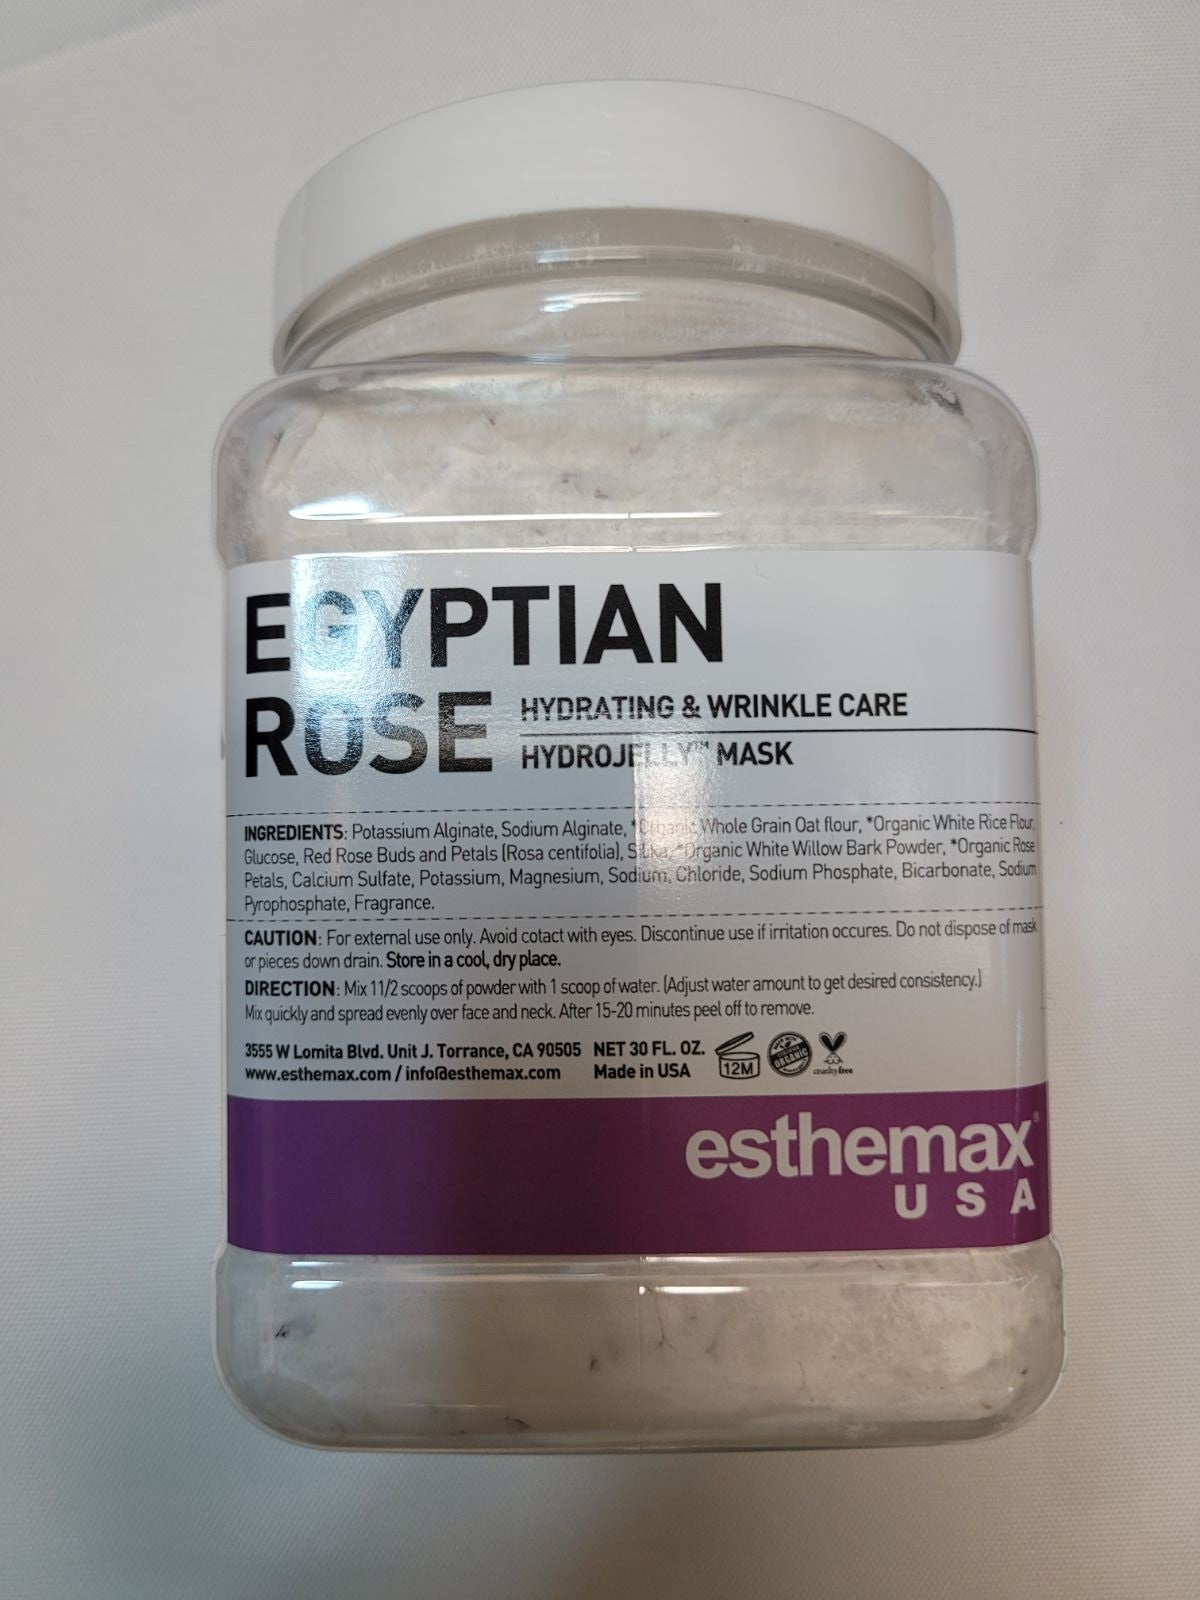 Esthemax Egyptian Rose Hydrojelly Mask